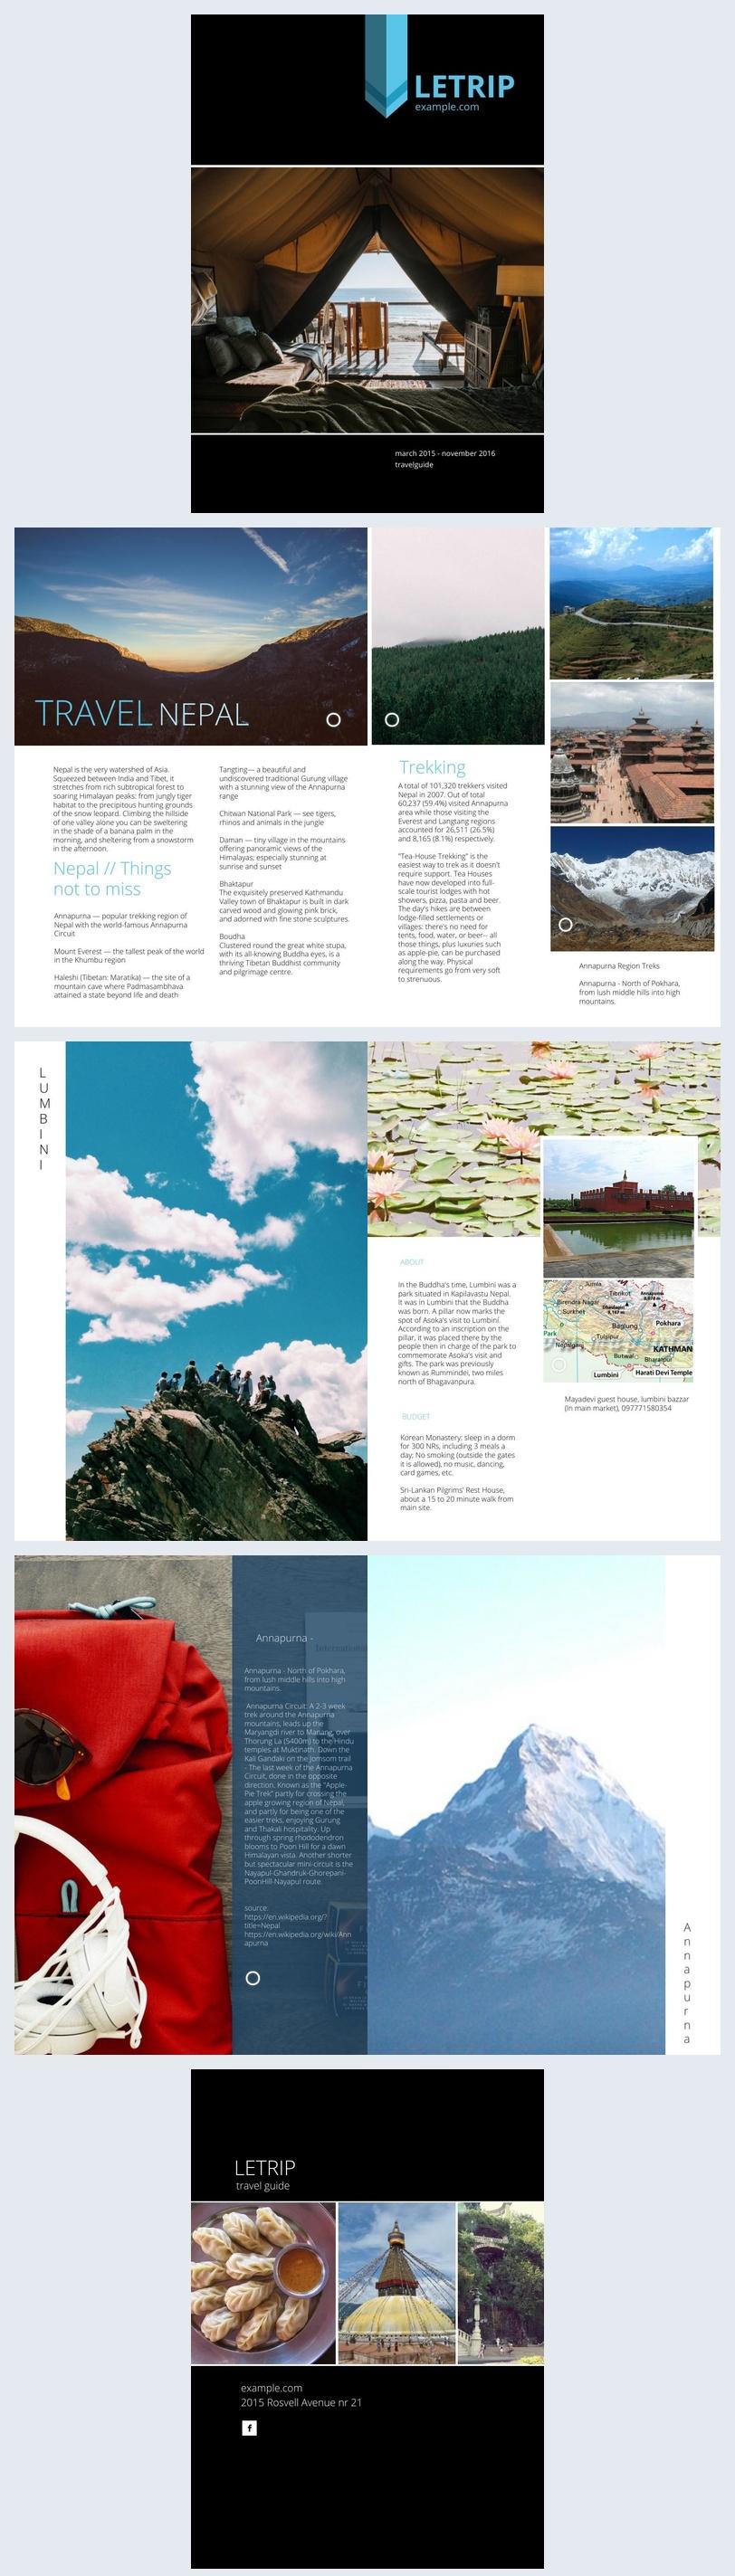 Diseño para revista moderna de viajes